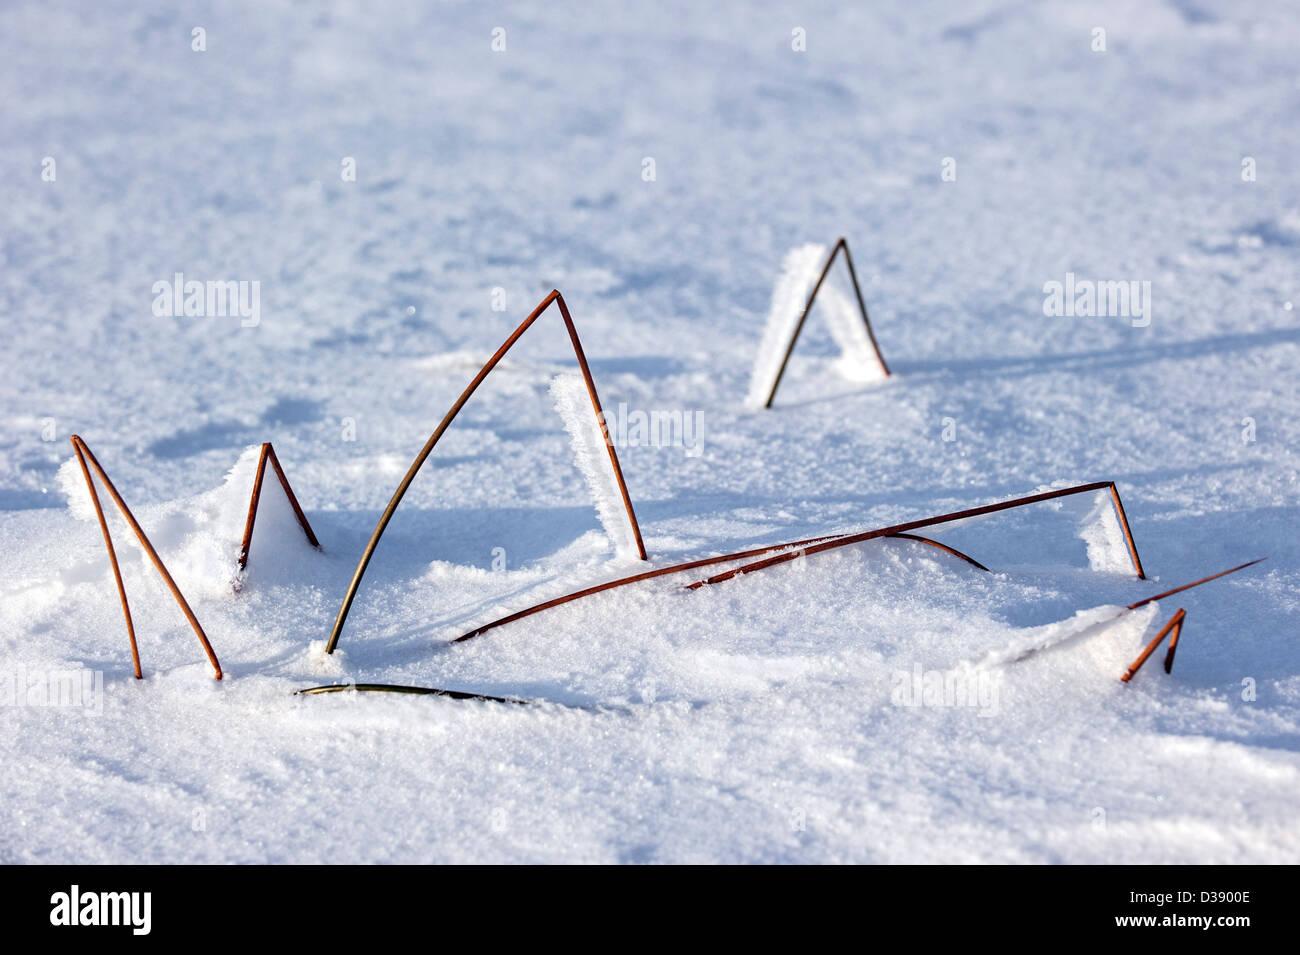 Hoar frost on broken grass stems in moorland in the snow in winter - Stock Image